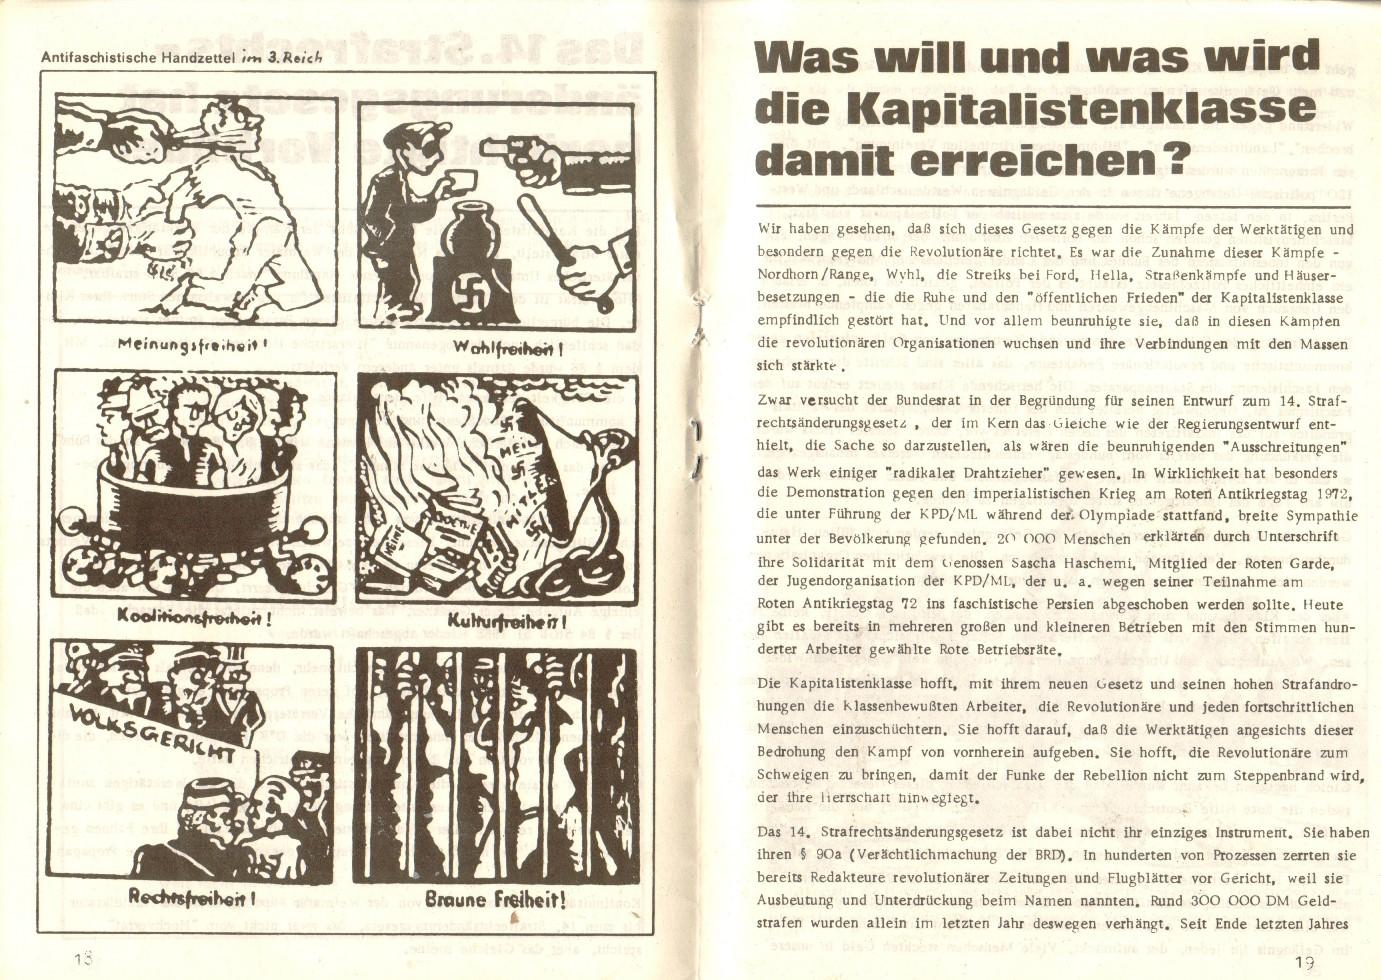 RHD_1976_Doku_Strafrechtsaenderungsgesetz_10